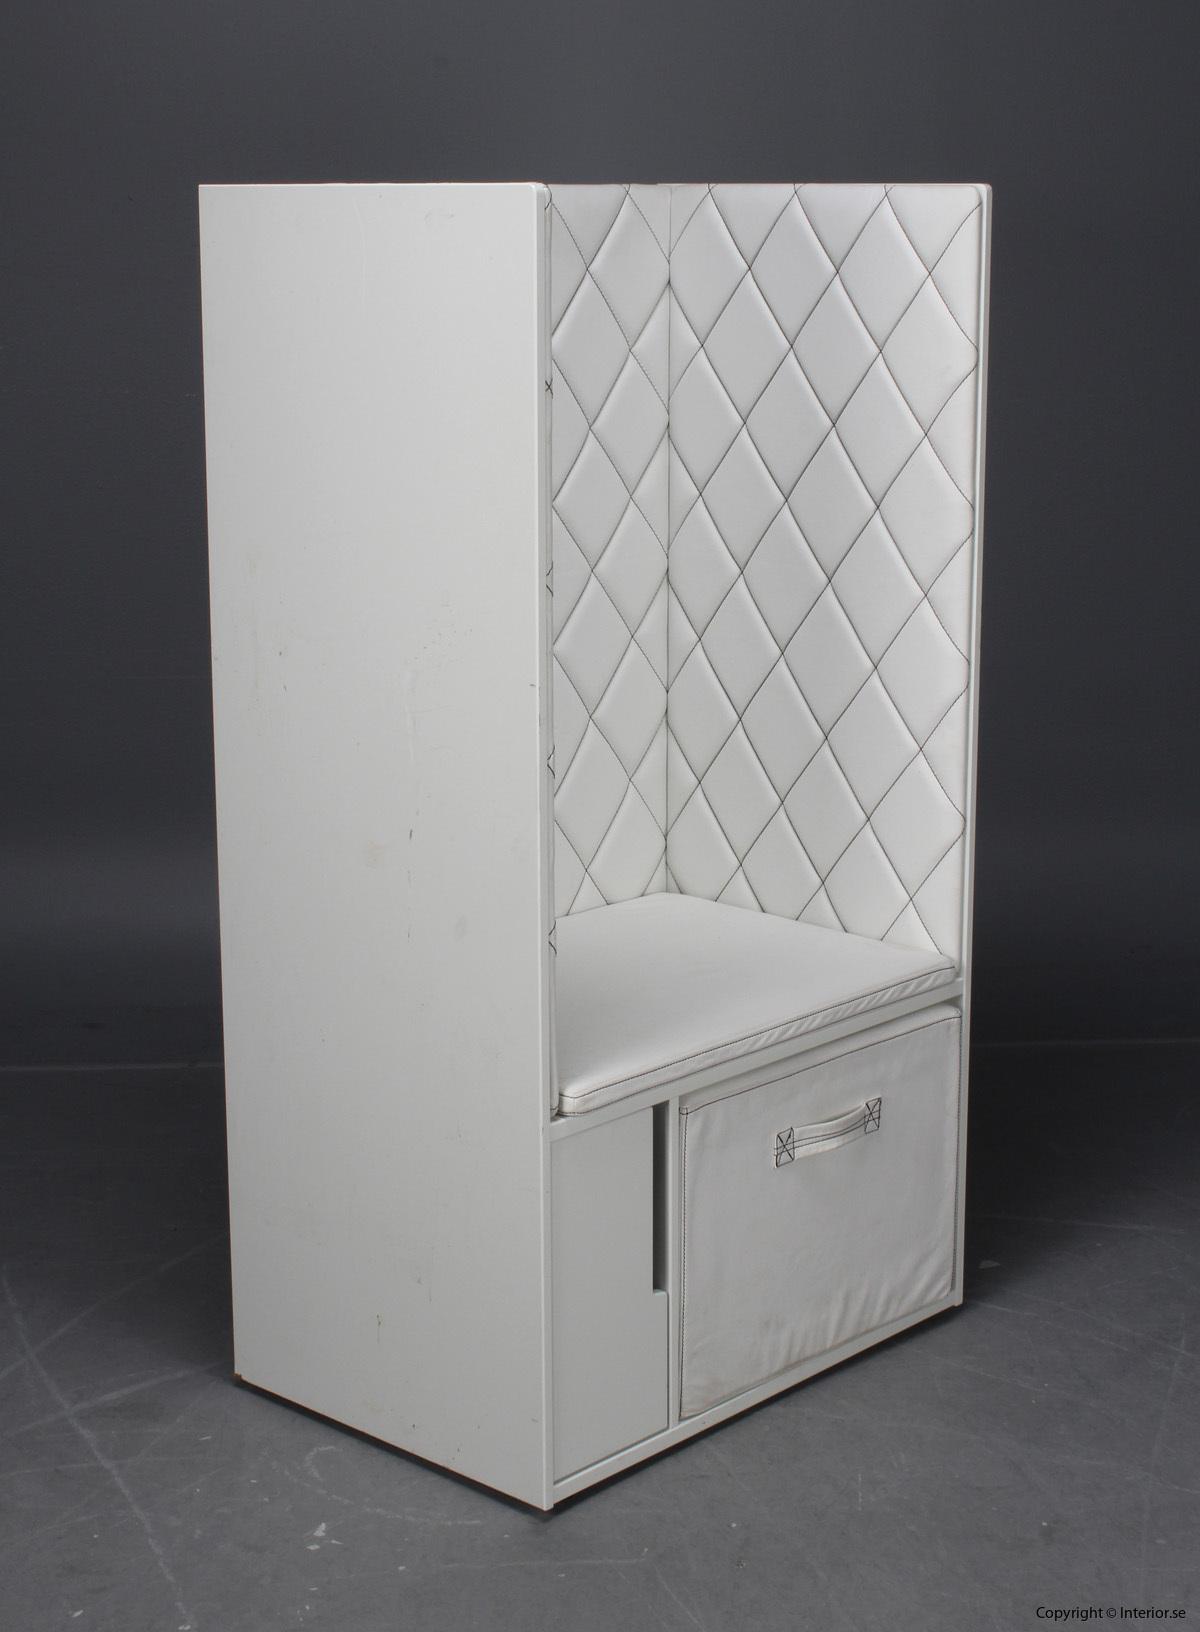 EFG Box (7)